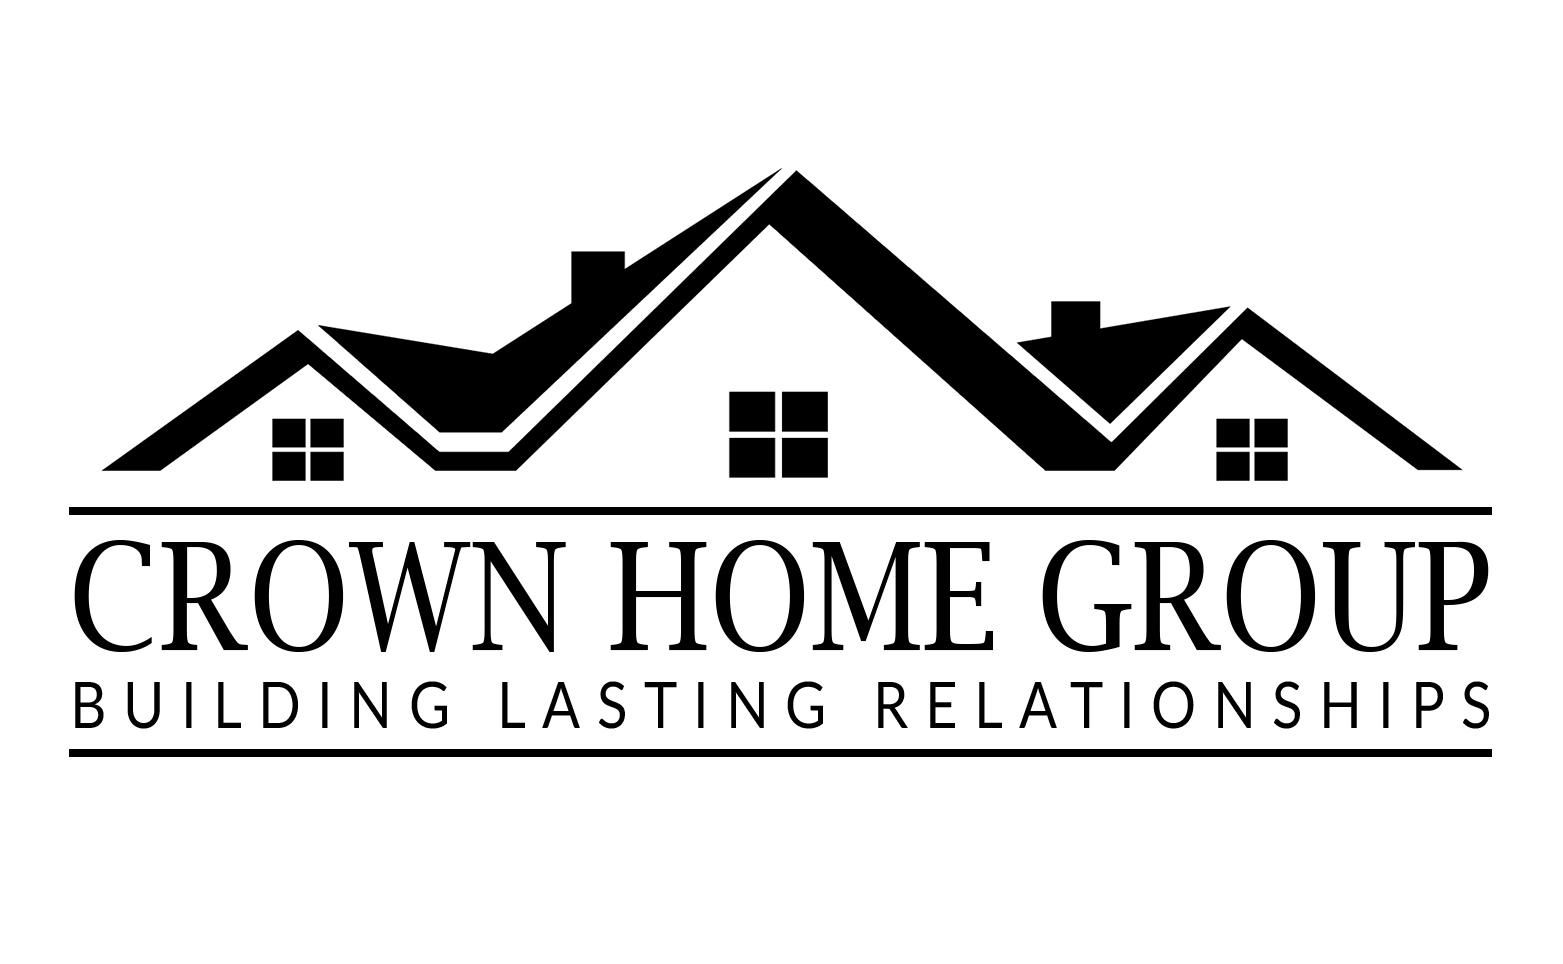 14501 grove resort avenue 1604 winter garden fl crown home group